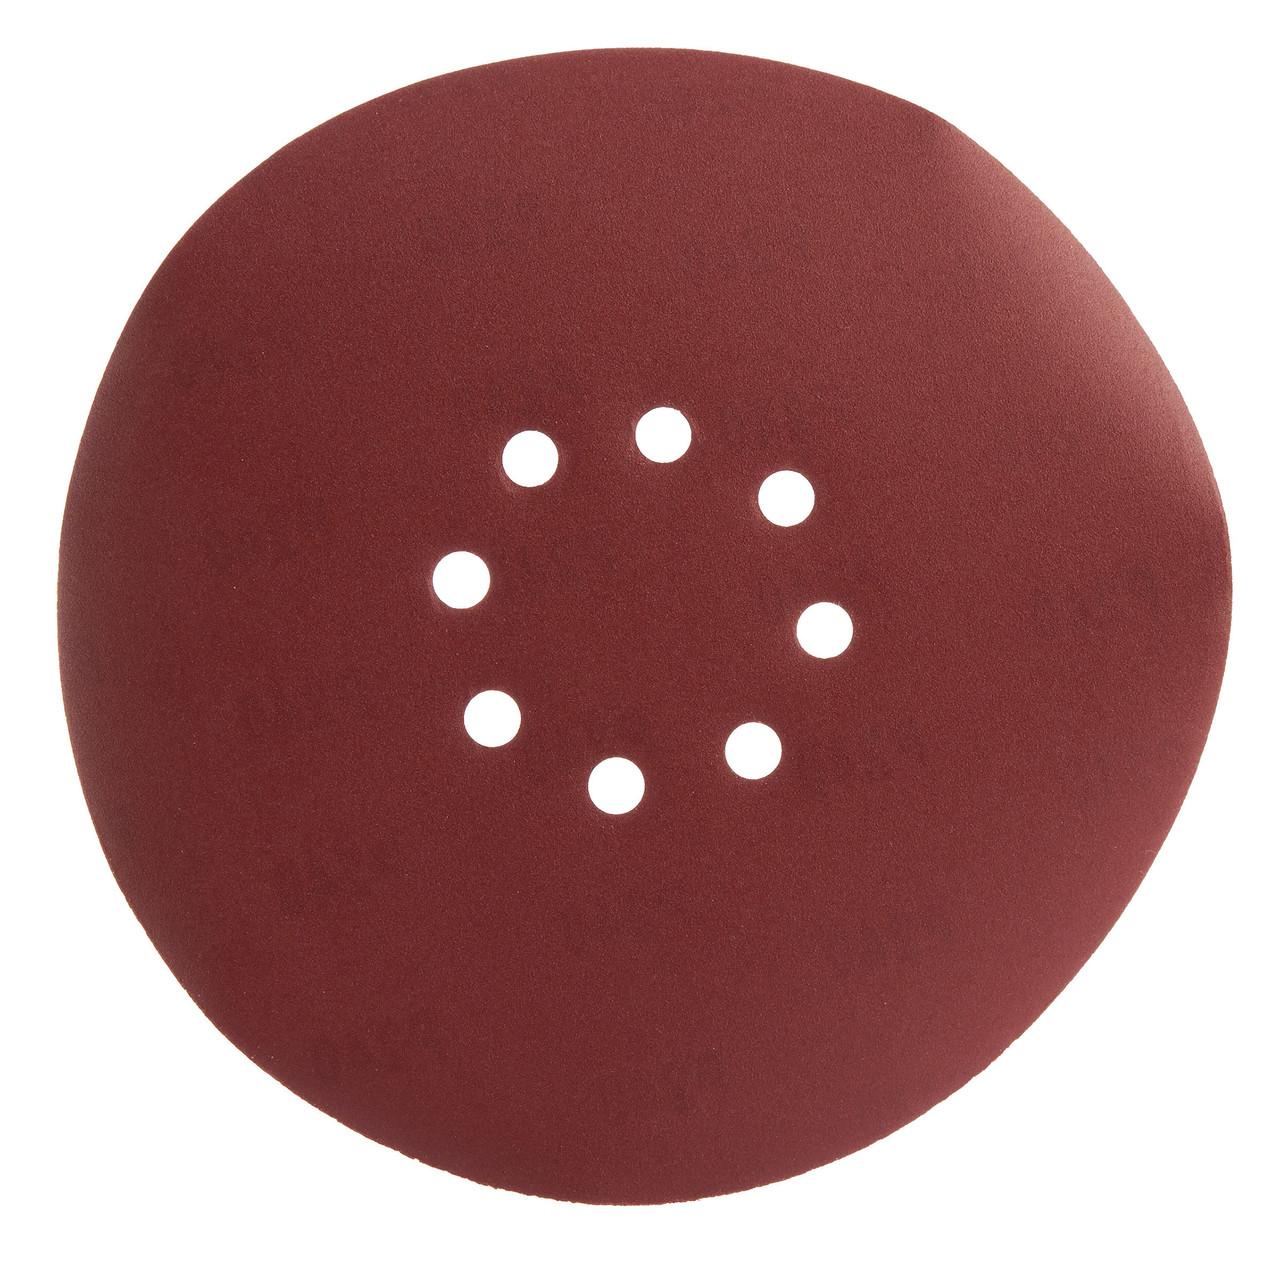 Evolution Powertools 078-0093 225mm Sanding Discs for Drywall Sanders 240 Grit